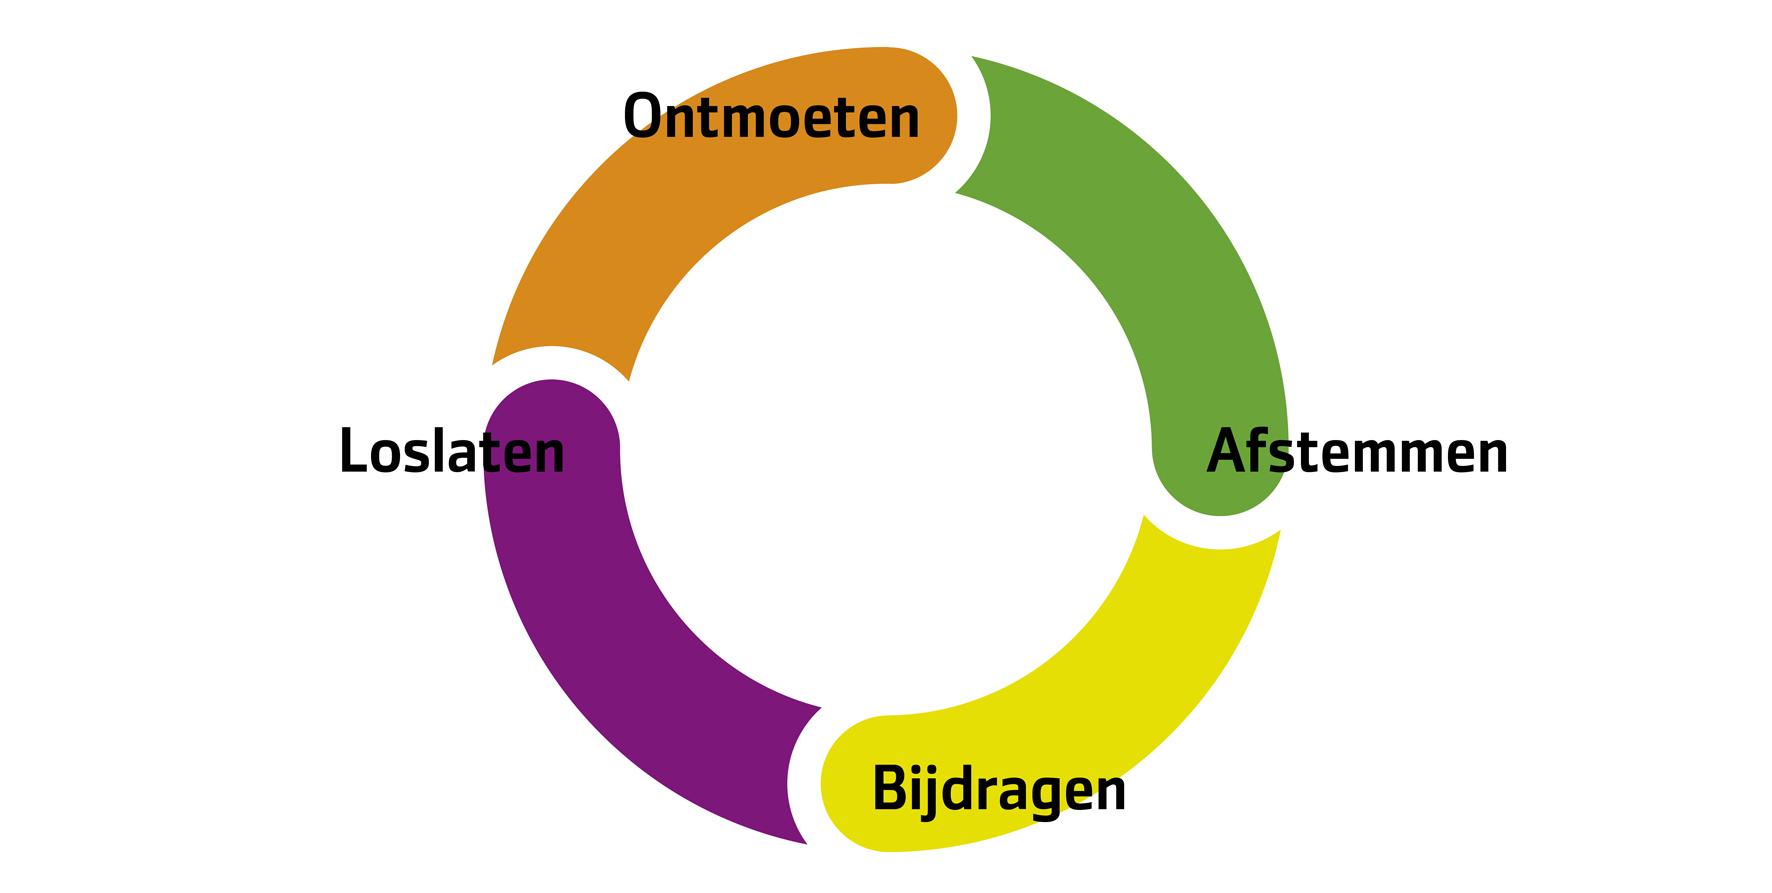 Intentie | Dim Creative ConsultancyDim Creative Consultancy: www.dimcreativeconsultancy.nl/?page_id=125